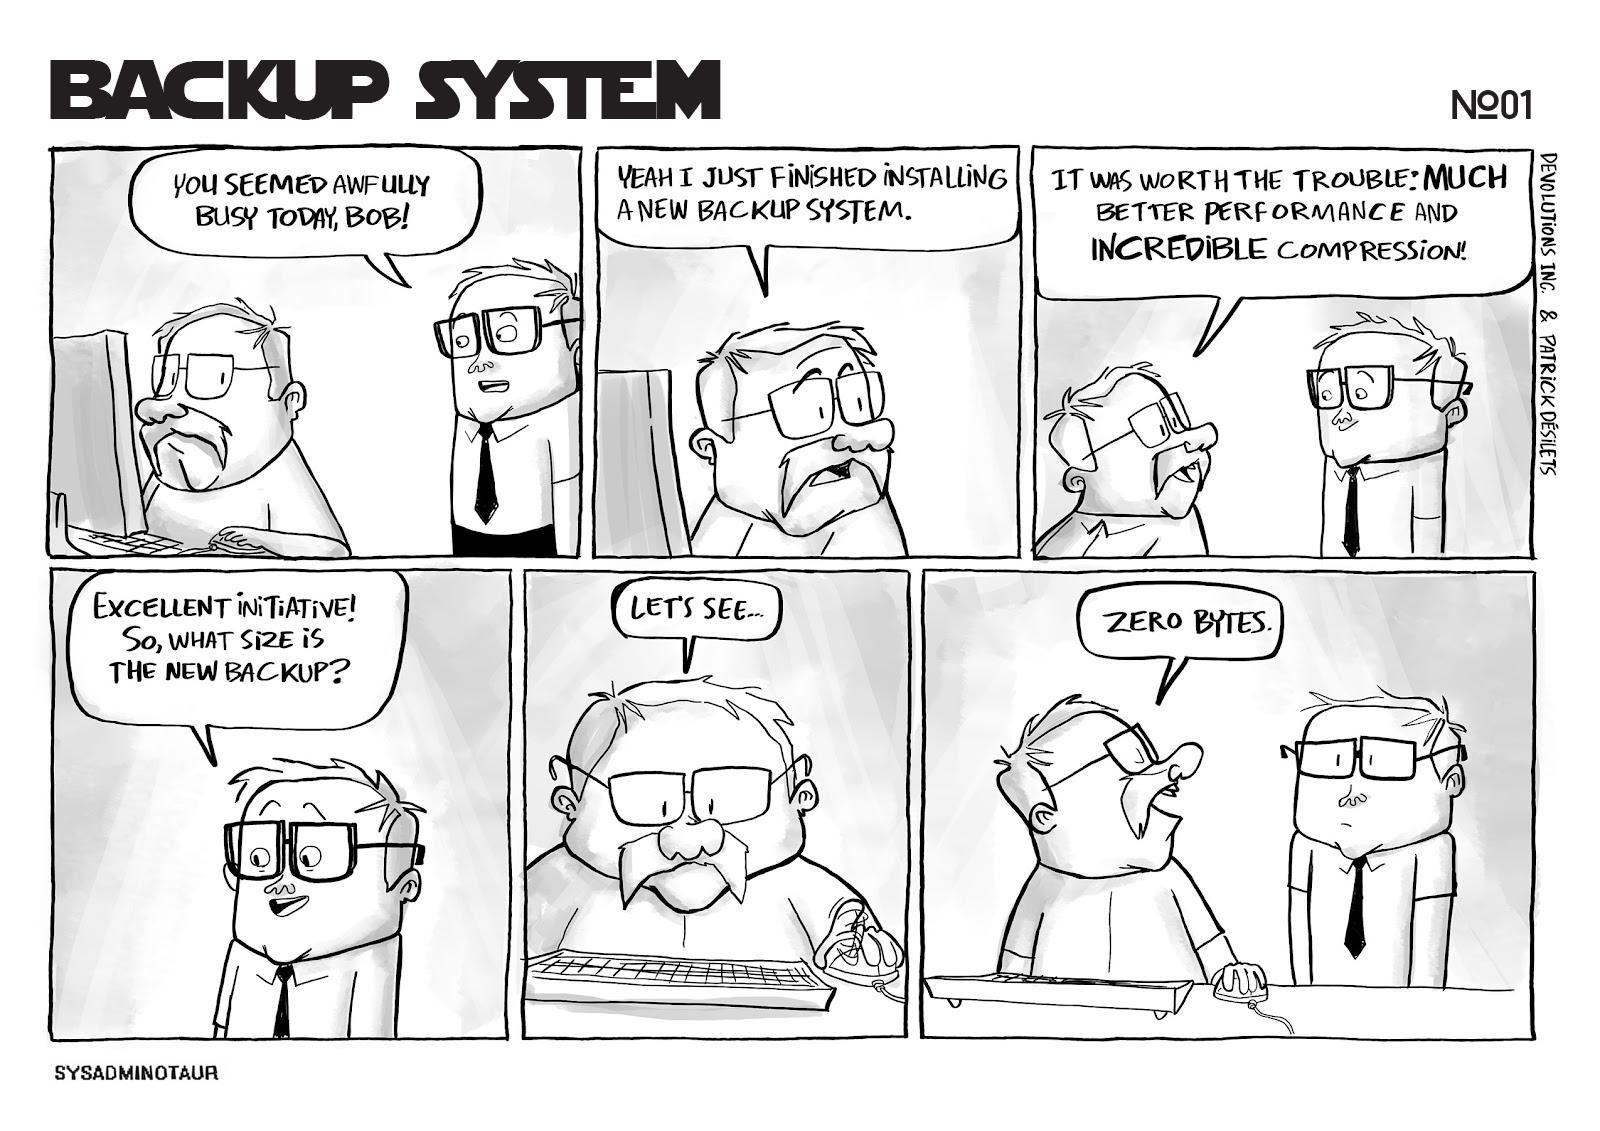 sysadminotaur-001-backup-system